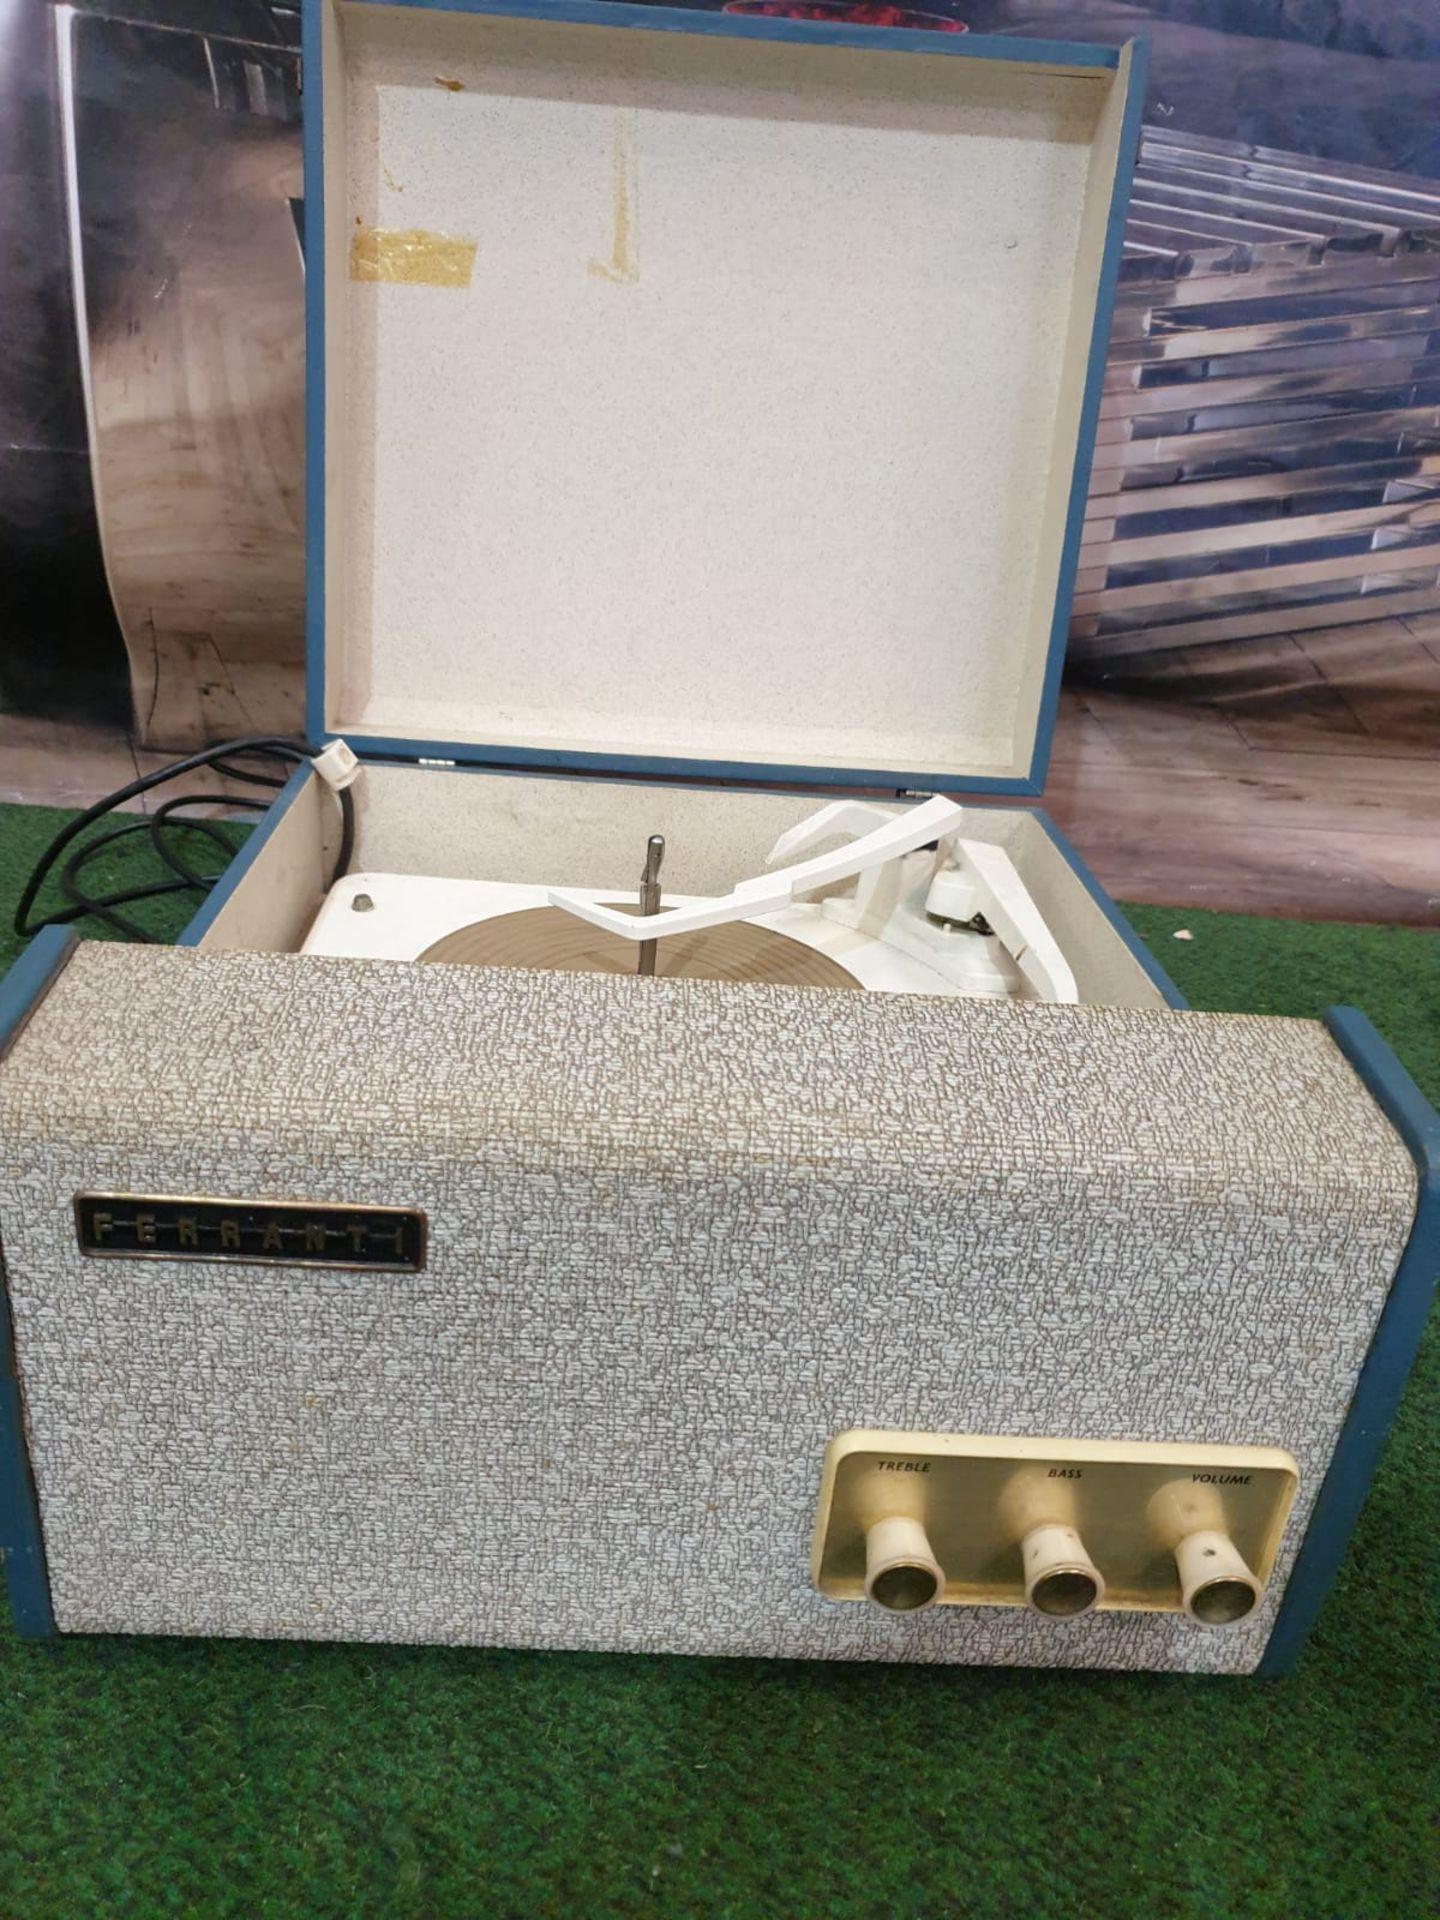 Travel record Player Blue Case Made By Ferranti Circa 1958 Ferranti or Ferranti International plc - Image 3 of 3